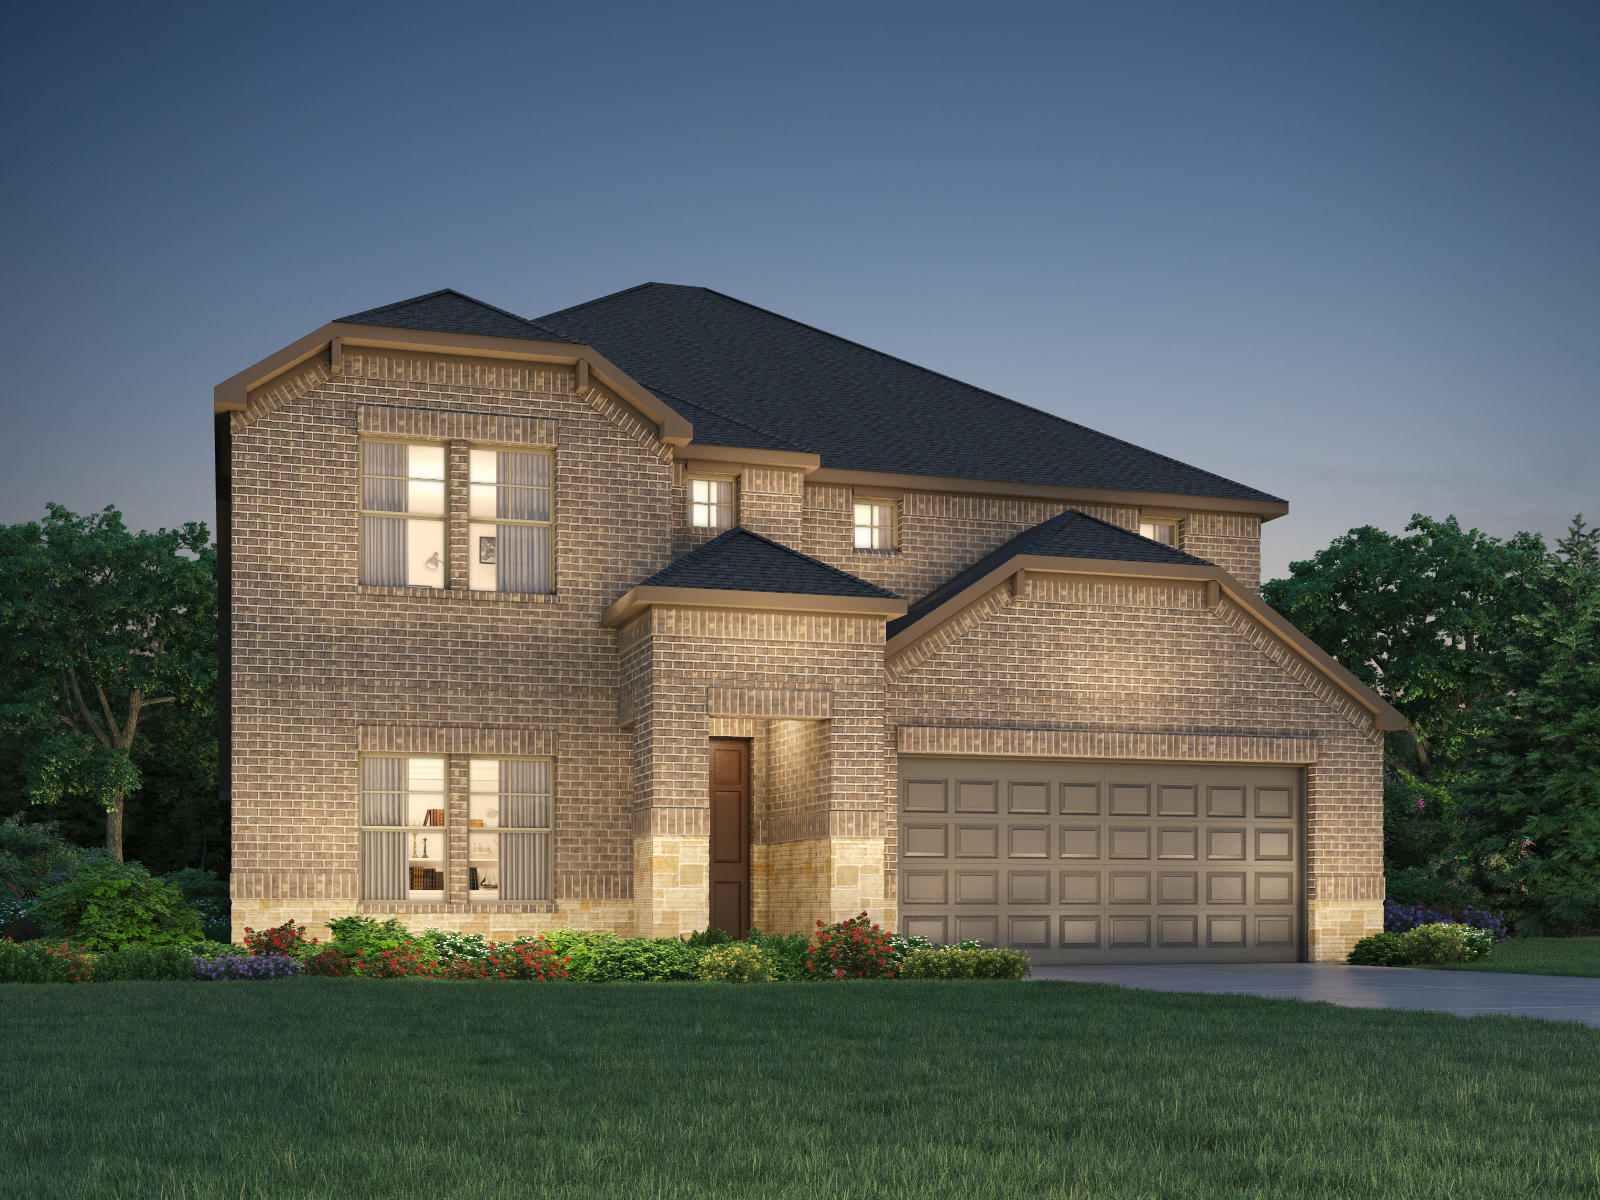 The Kessler (L454 LN) Plan, Houston, TX 77089 - 5 Bed, 3 Bath Single-Family  Home - 7 Photos   Trulia